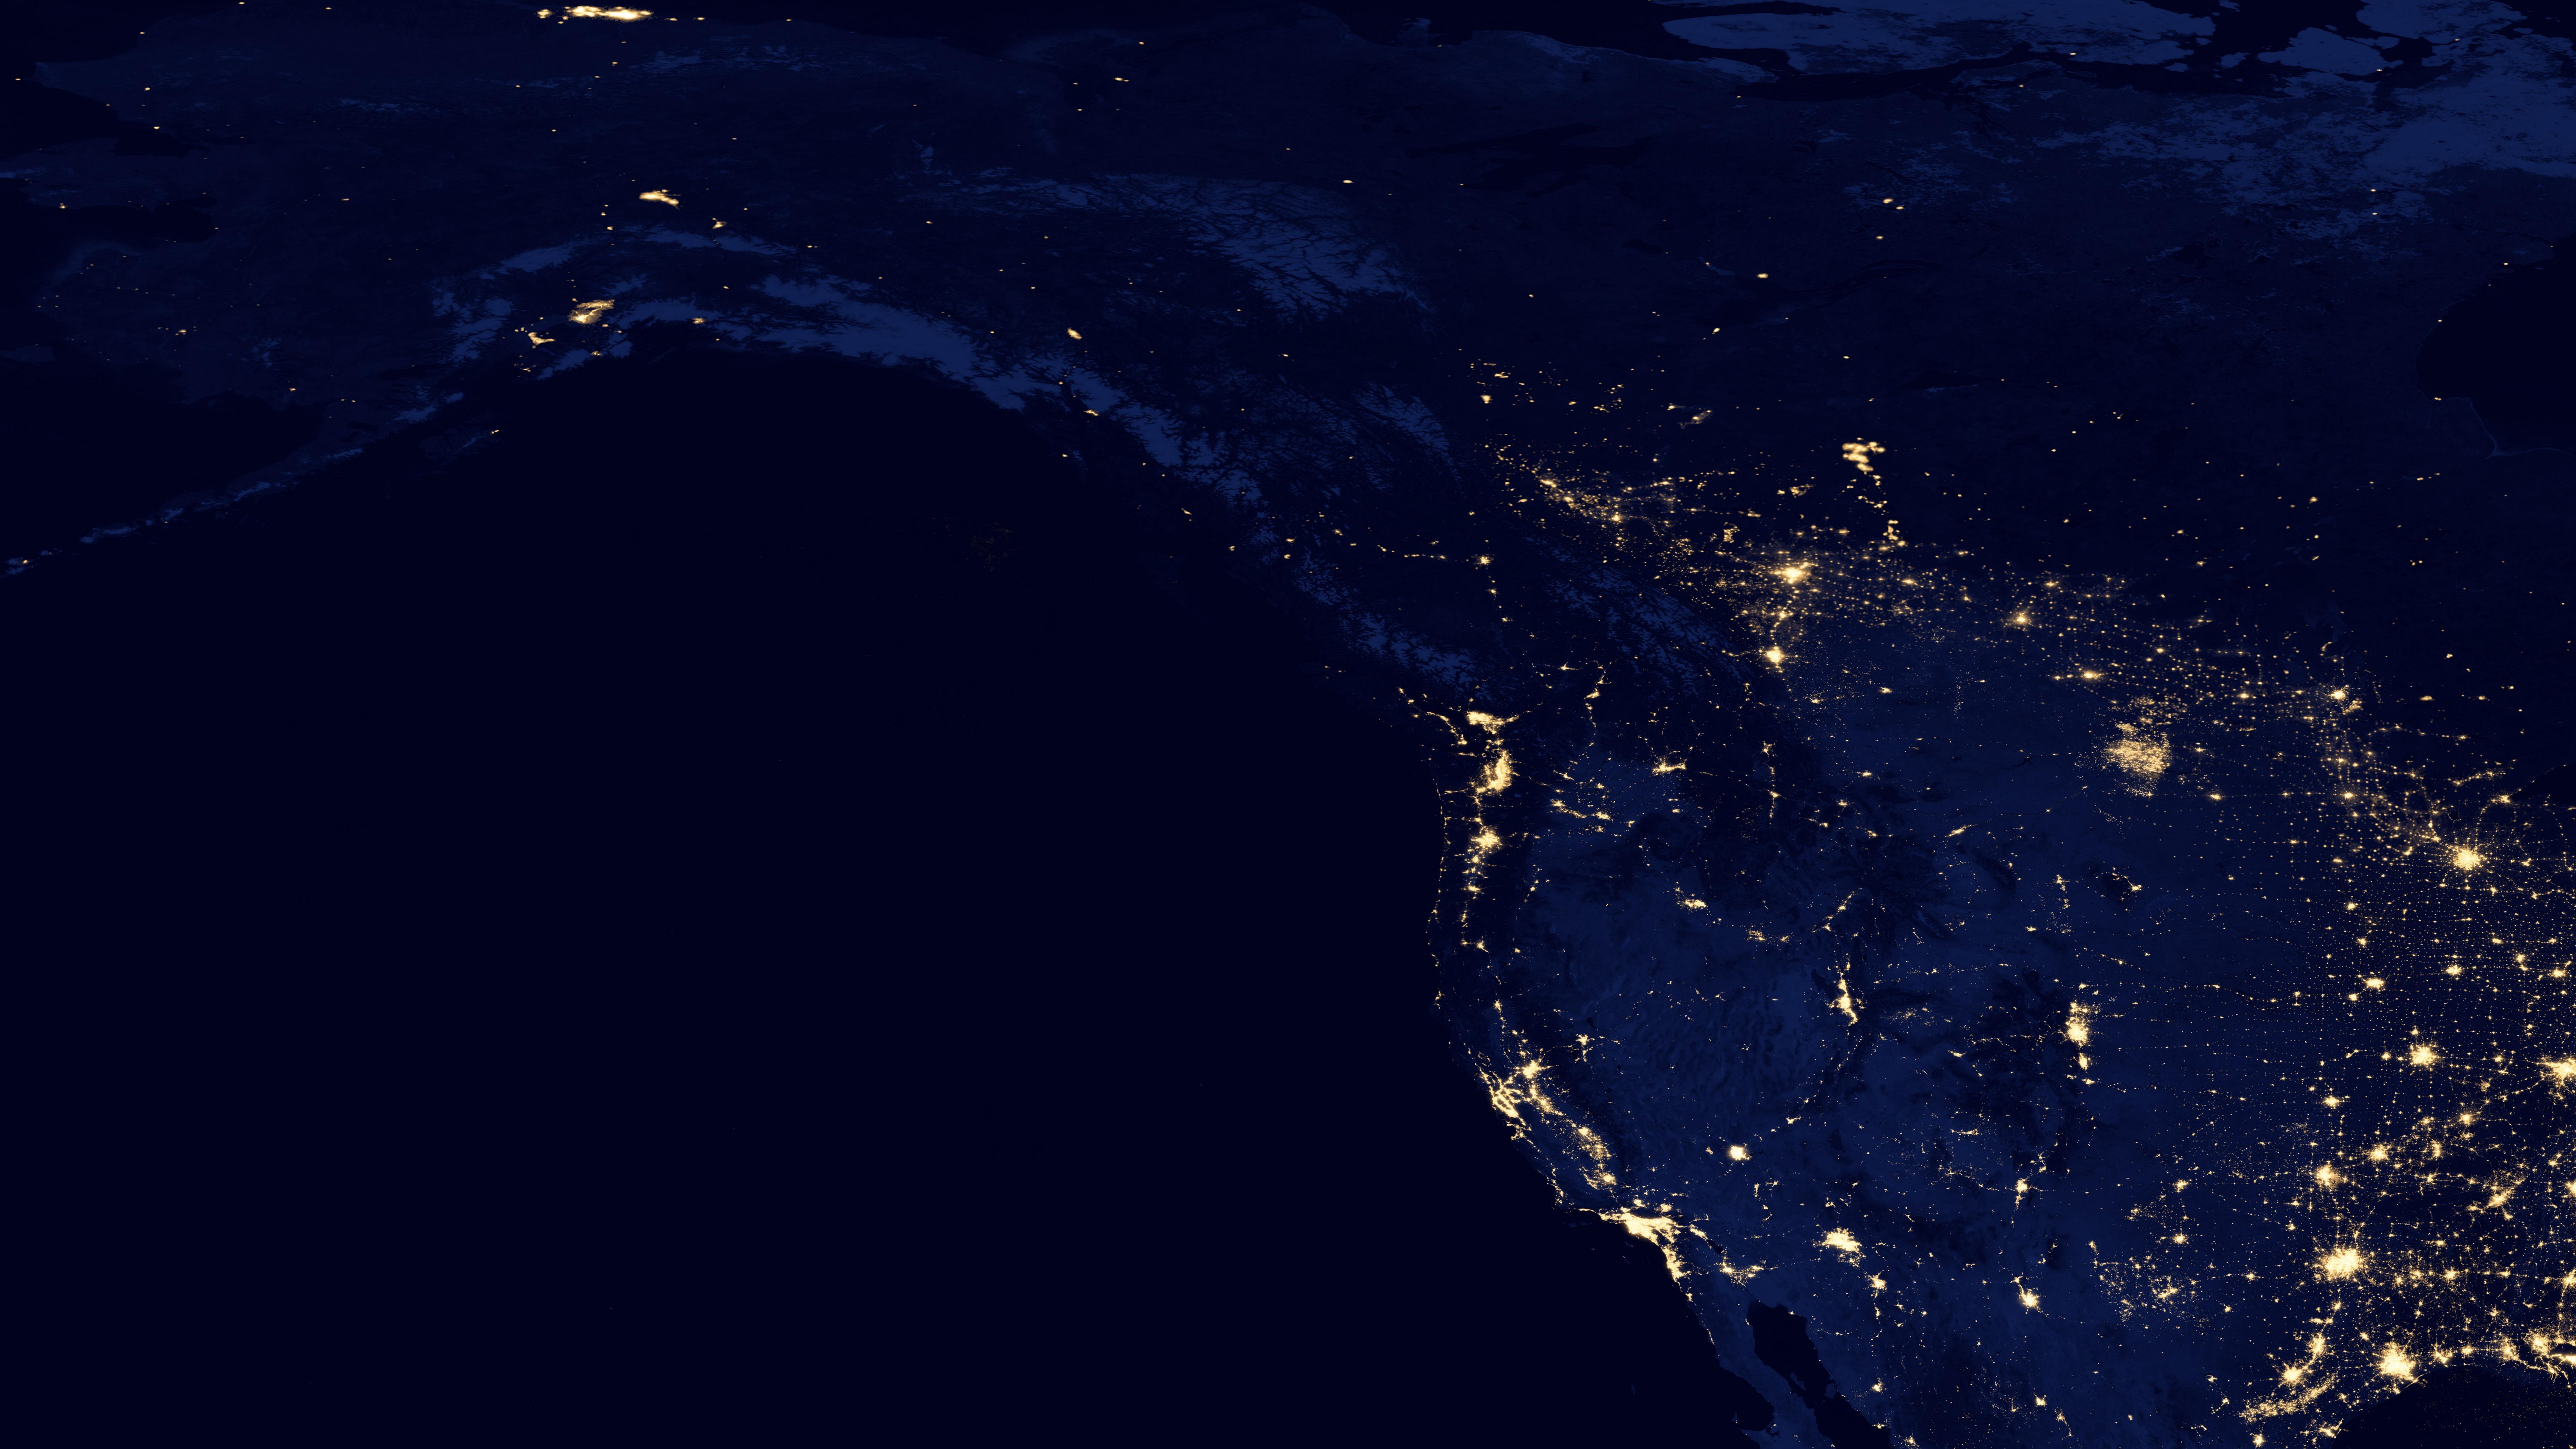 Night Lights Along the Pacific Coast 2012 wallpaper